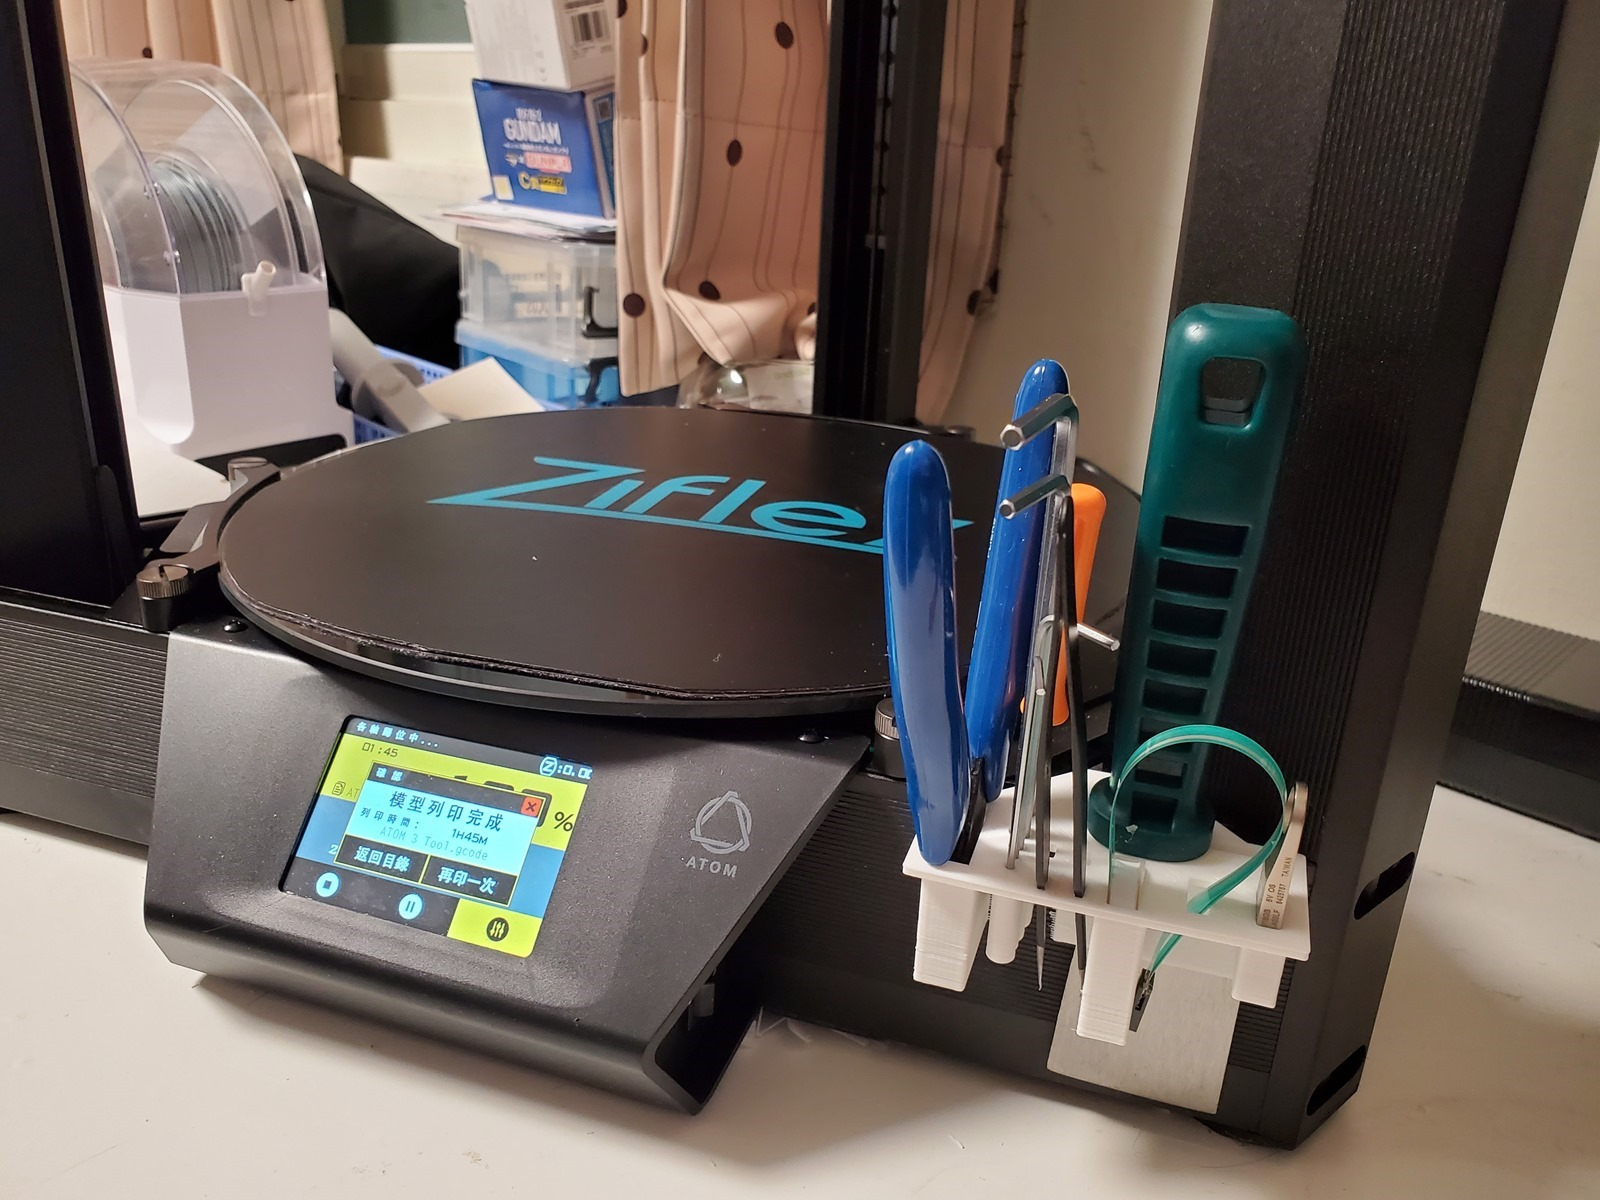 [3DP] 3D 列印作品: ATOM 3 / ATOM 3 Lite 工具架 @3C 達人廖阿輝